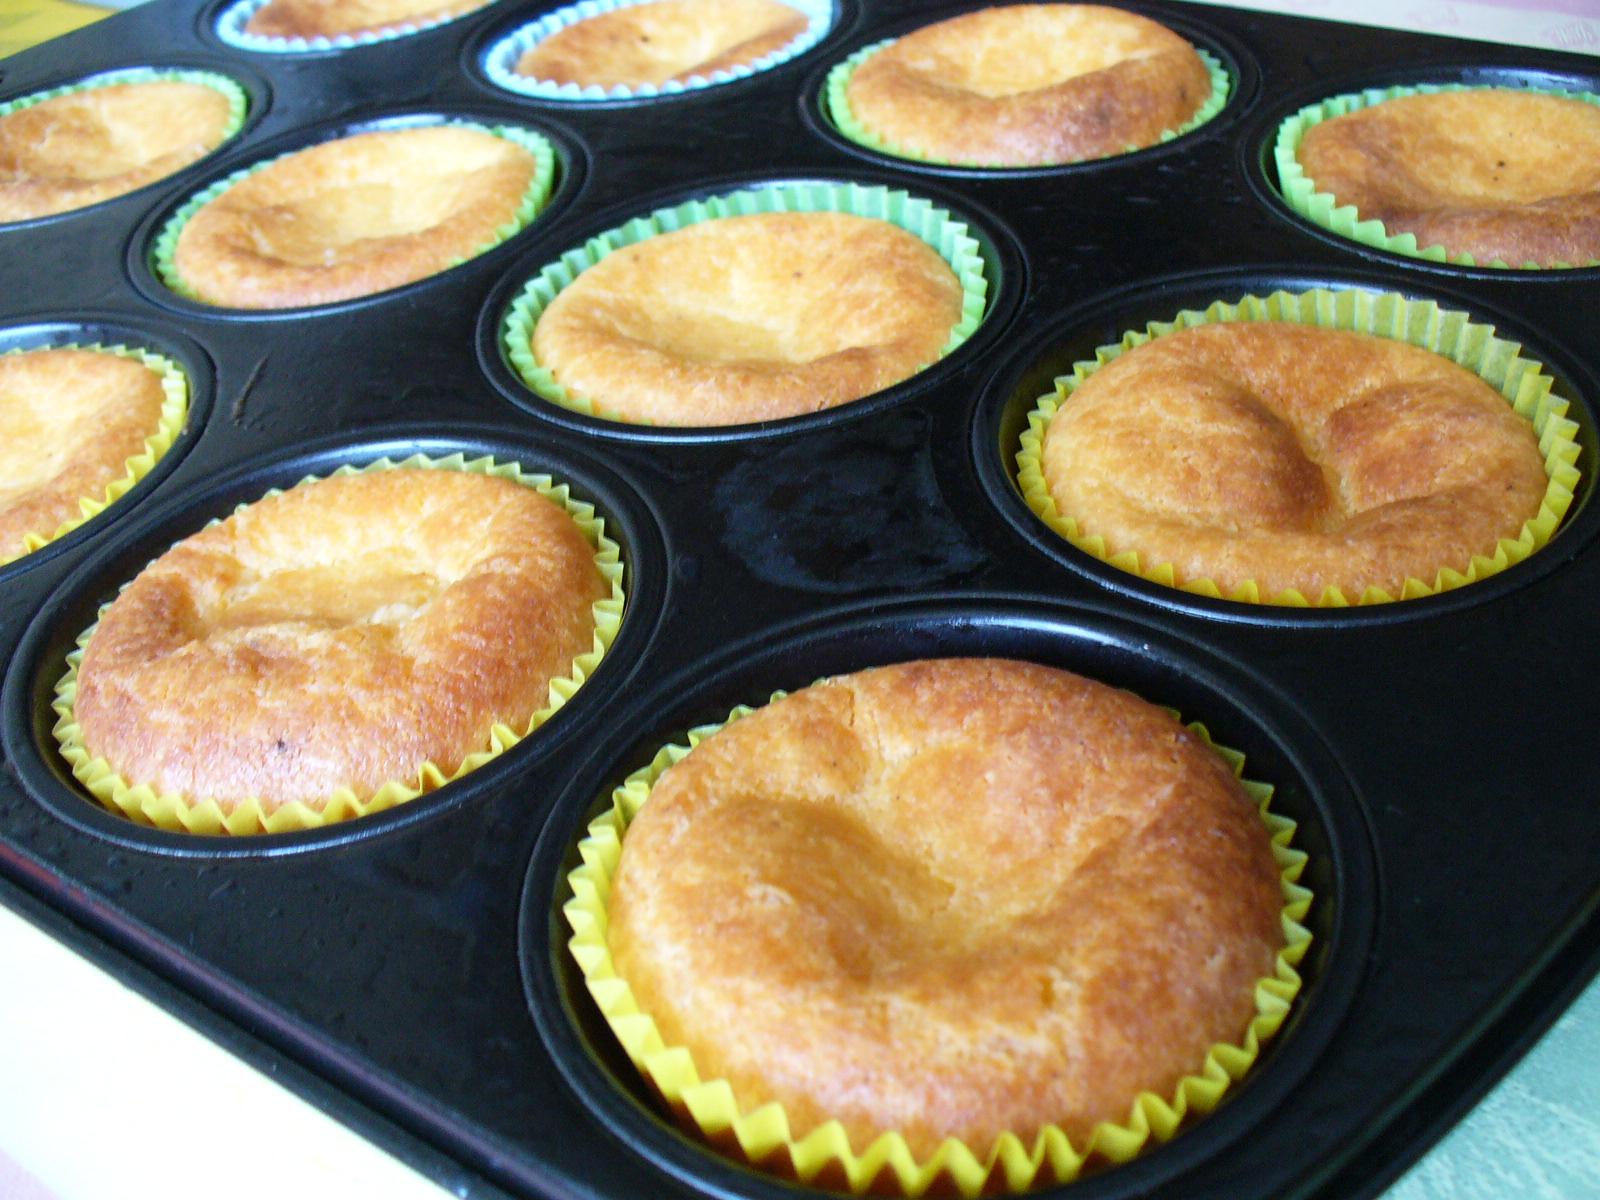 food reports vegan k sekuchen muffins. Black Bedroom Furniture Sets. Home Design Ideas